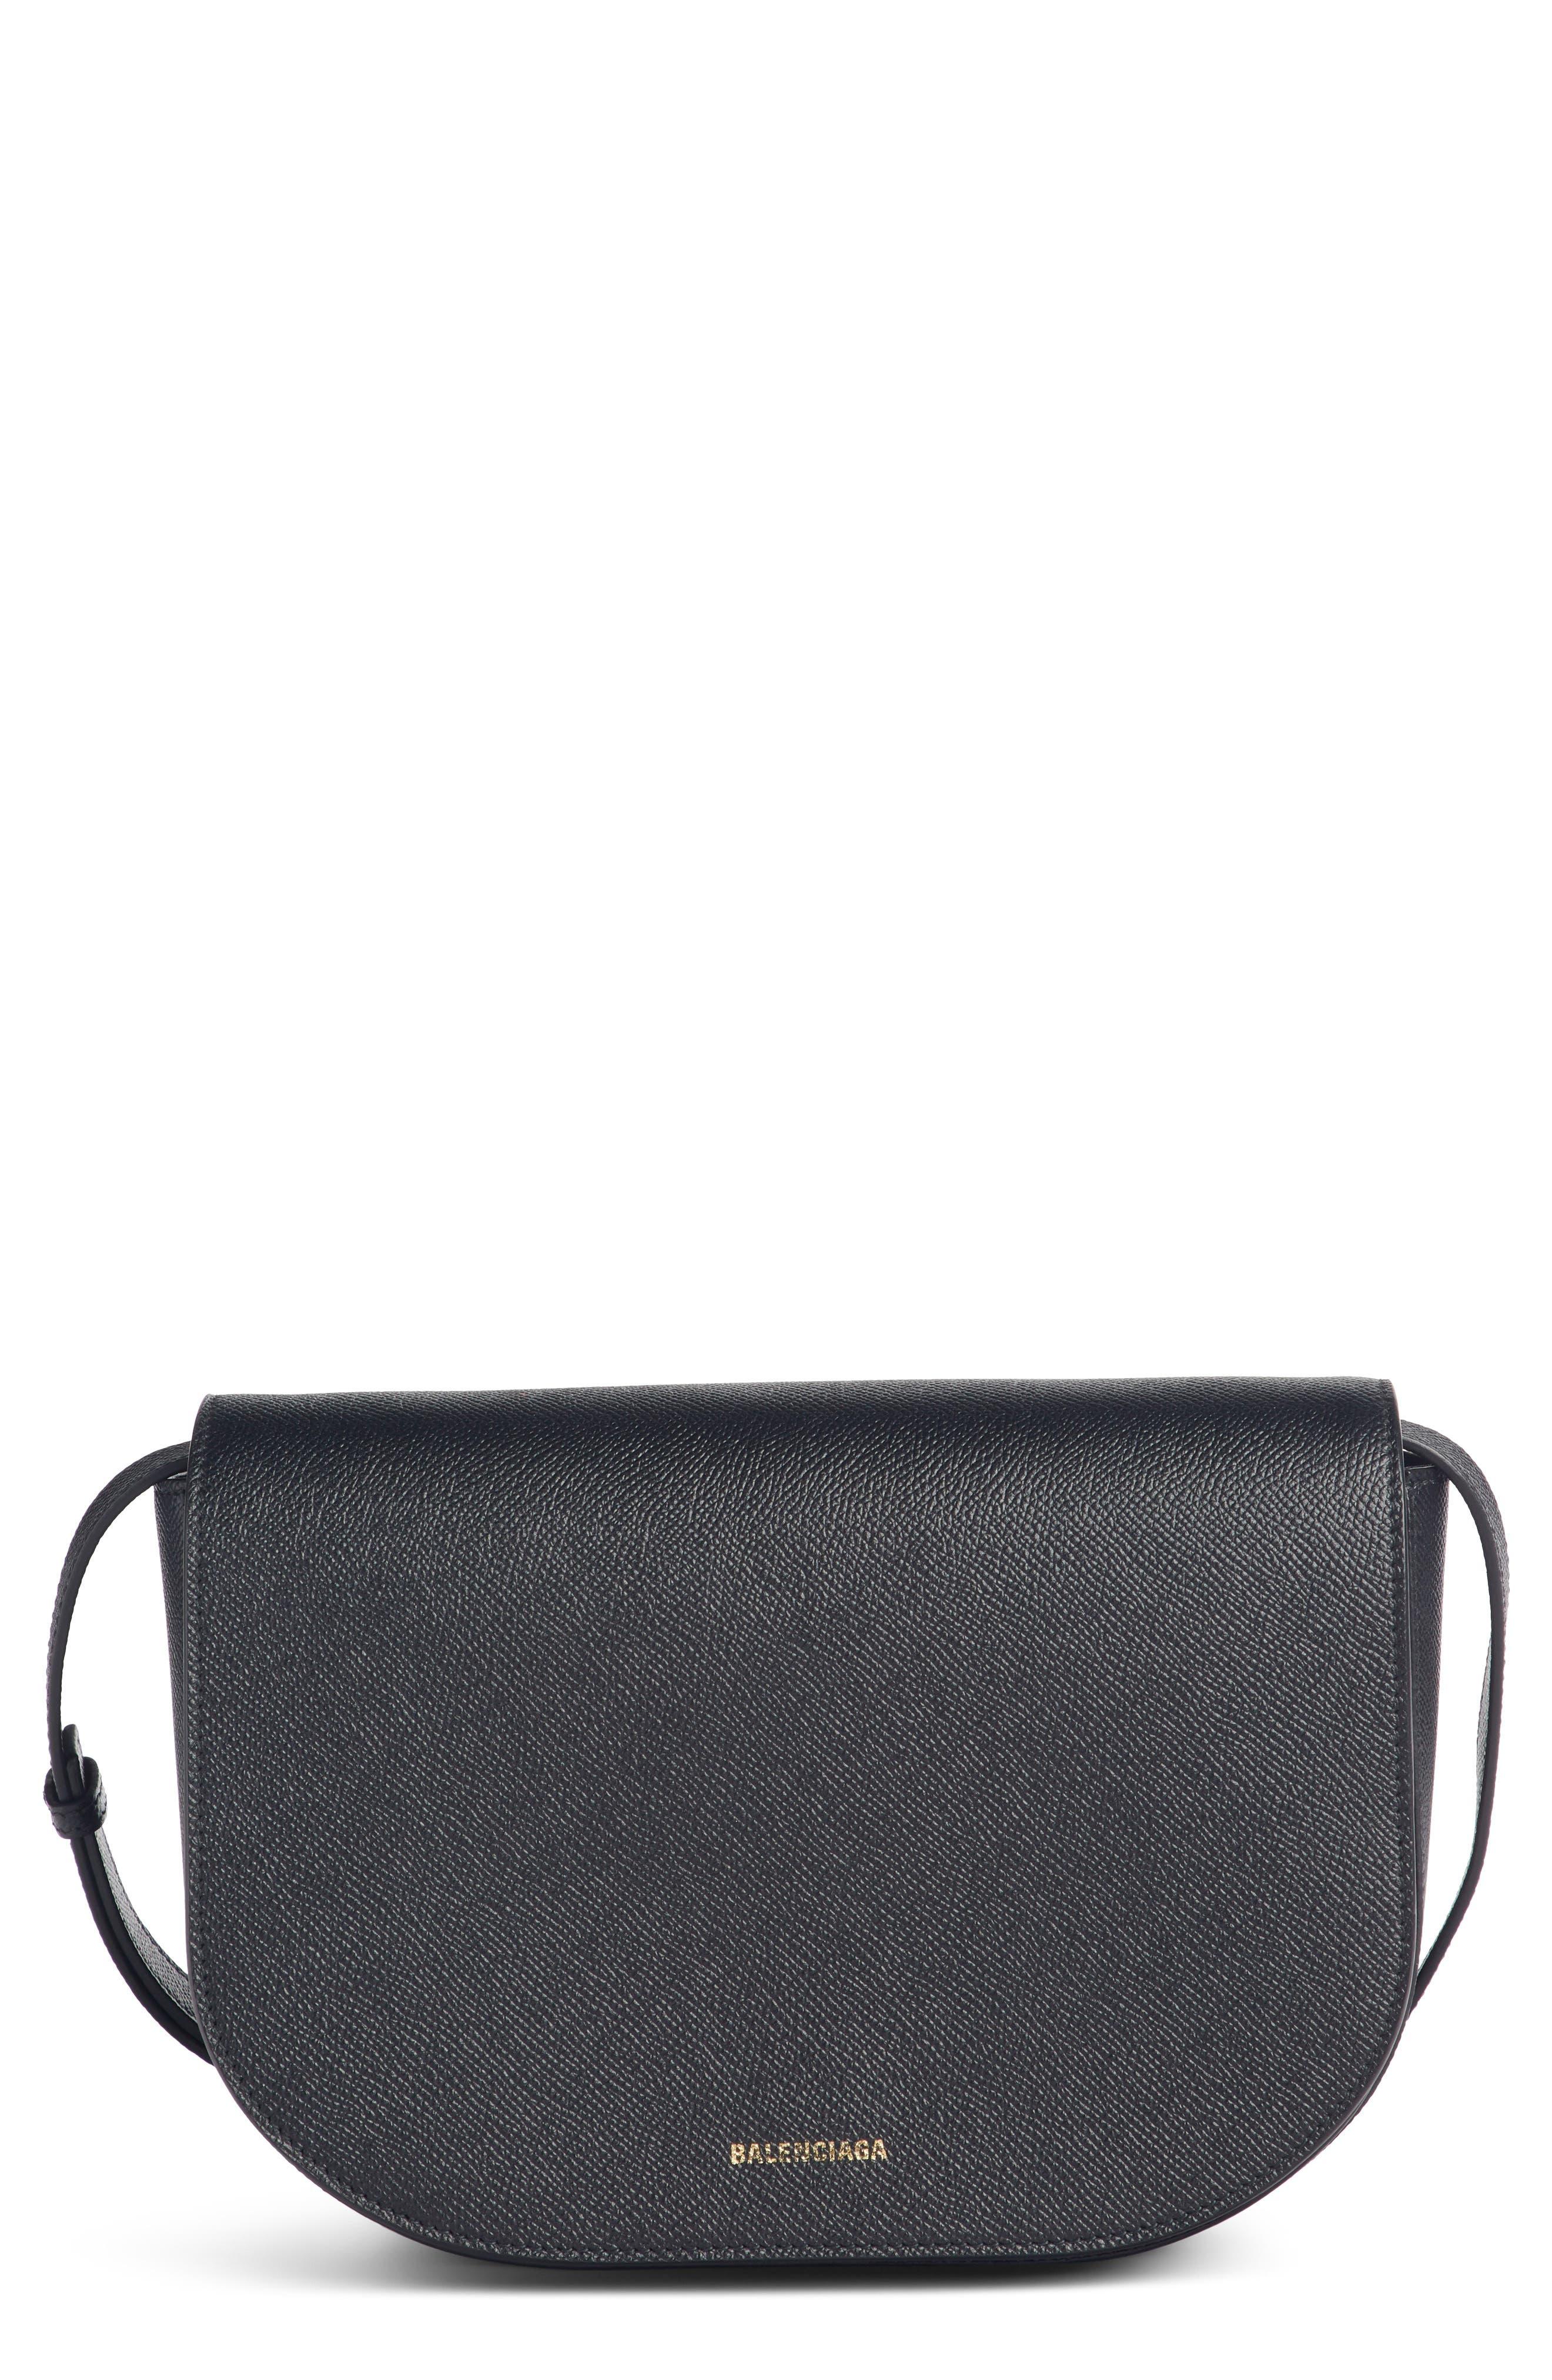 Small Ville Logo Leather Saddle Bag,                         Main,                         color, NOIR/ BLANC